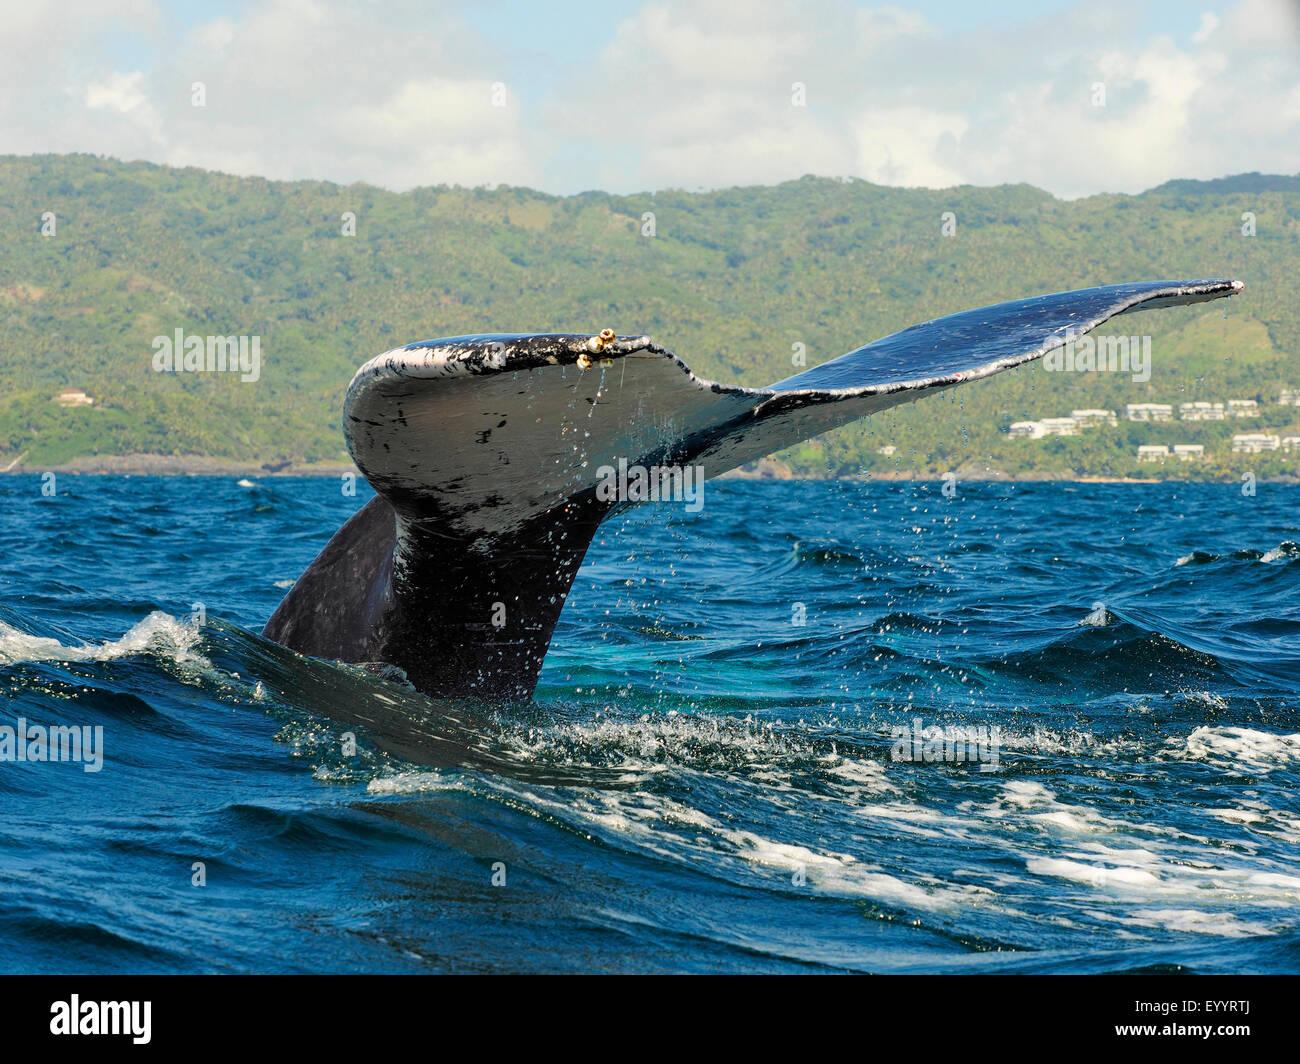 La ballena jorobada (Megaptera novaeangliae), aletas traseras, Samana, República Dominicana Imagen De Stock